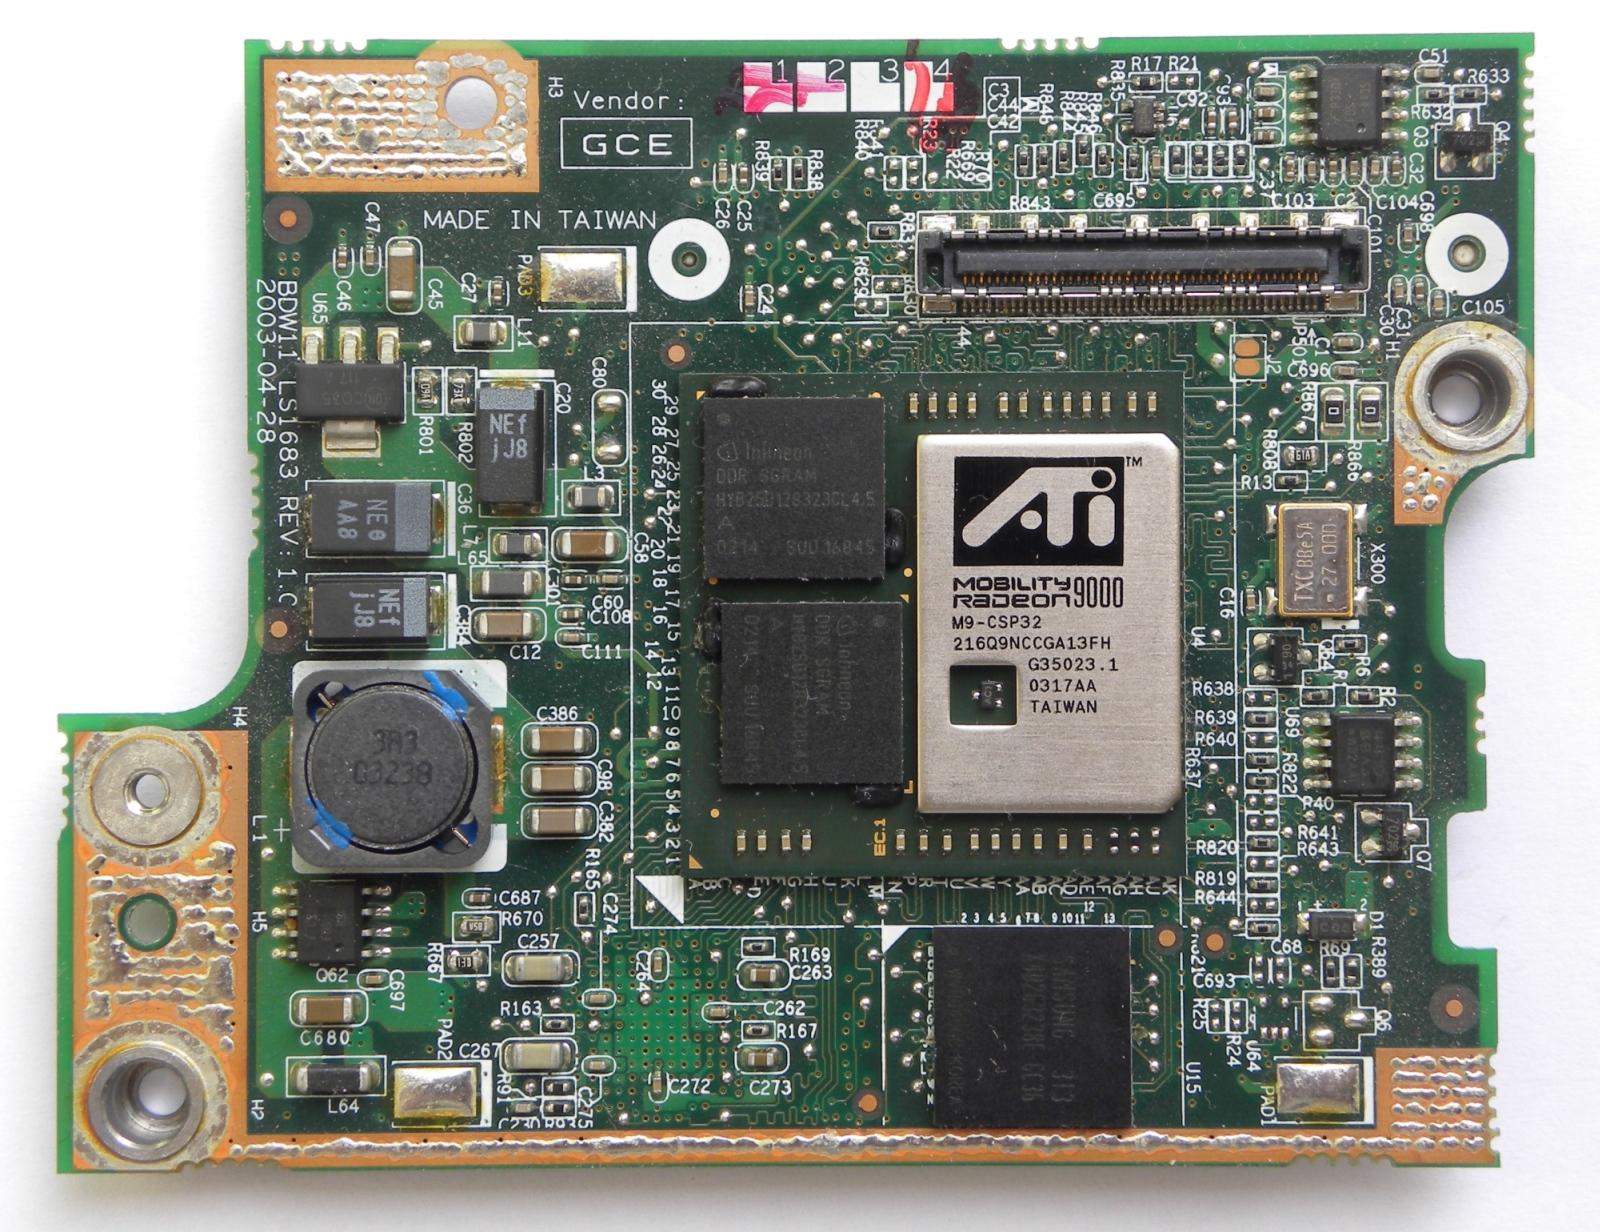 Ati Mobility Radeon 9600 M10 Driver Download